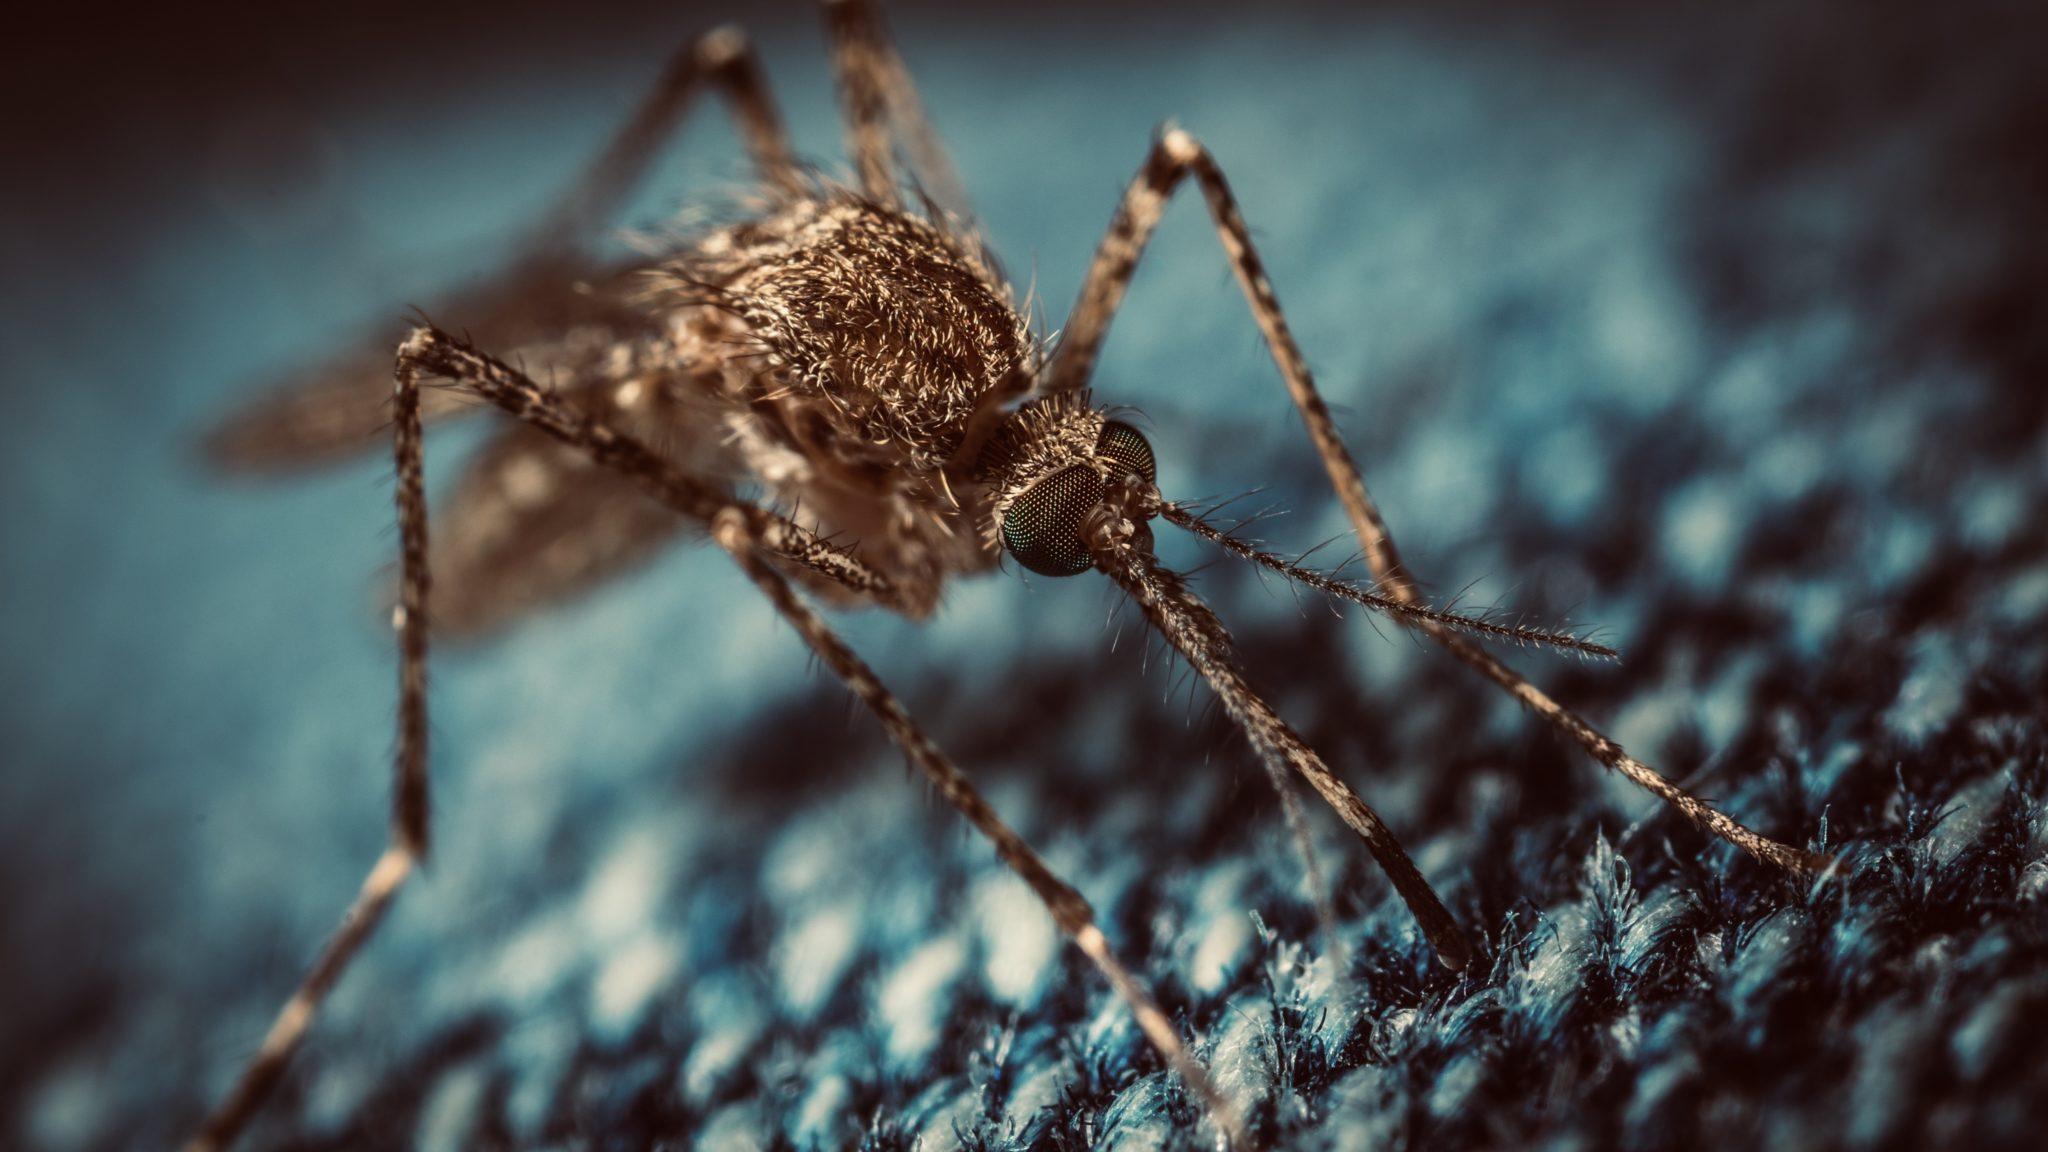 Walria muggenskitje